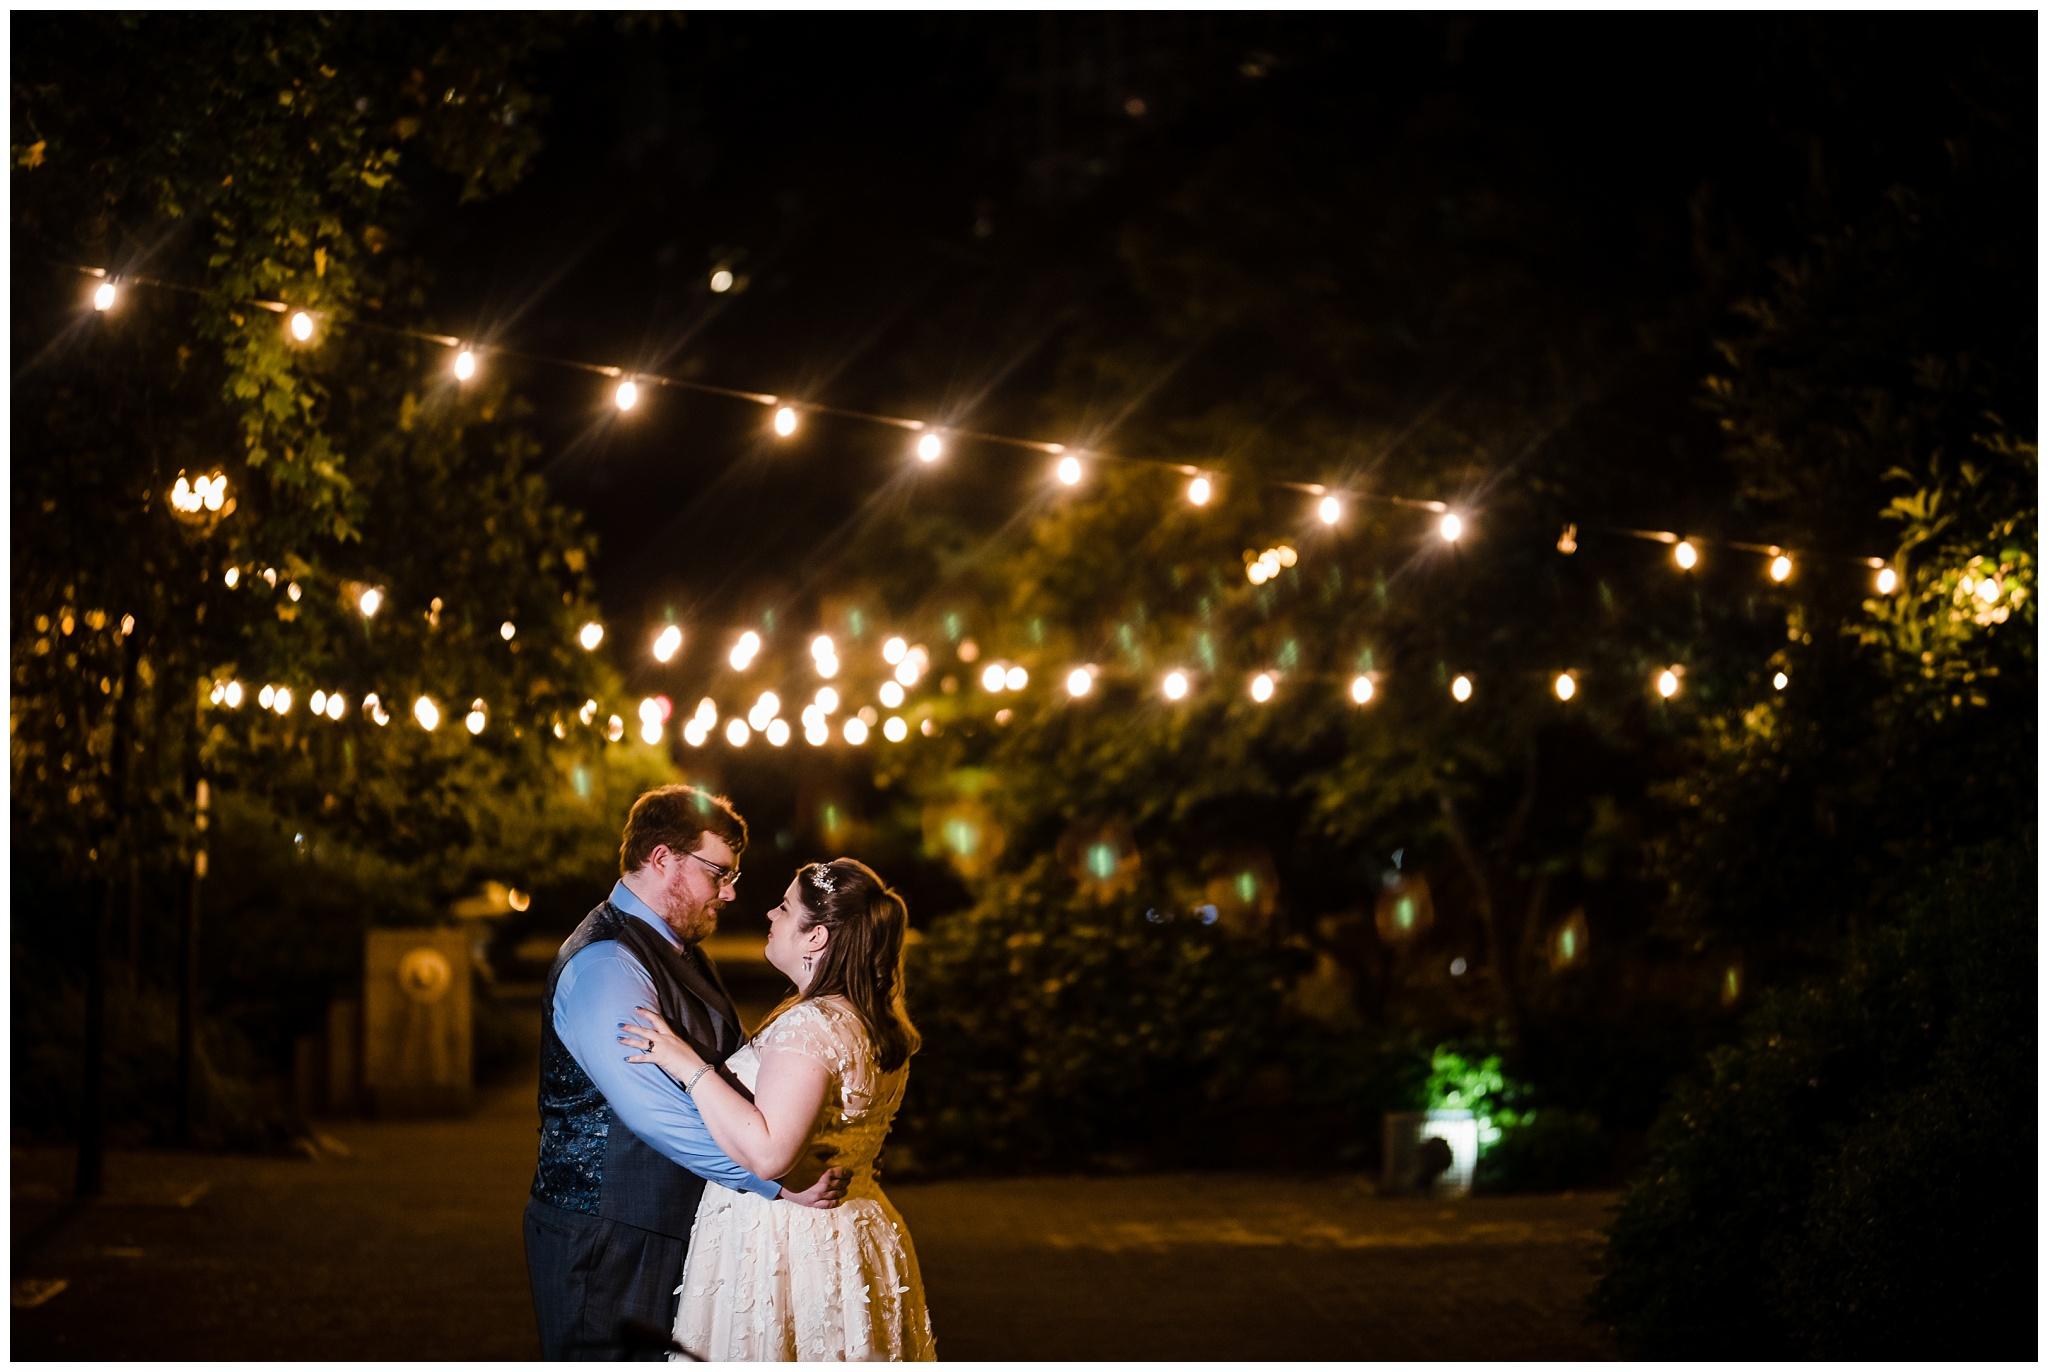 The Loft at Earls Wedding Yaletown BC Photographer_0040.jpg